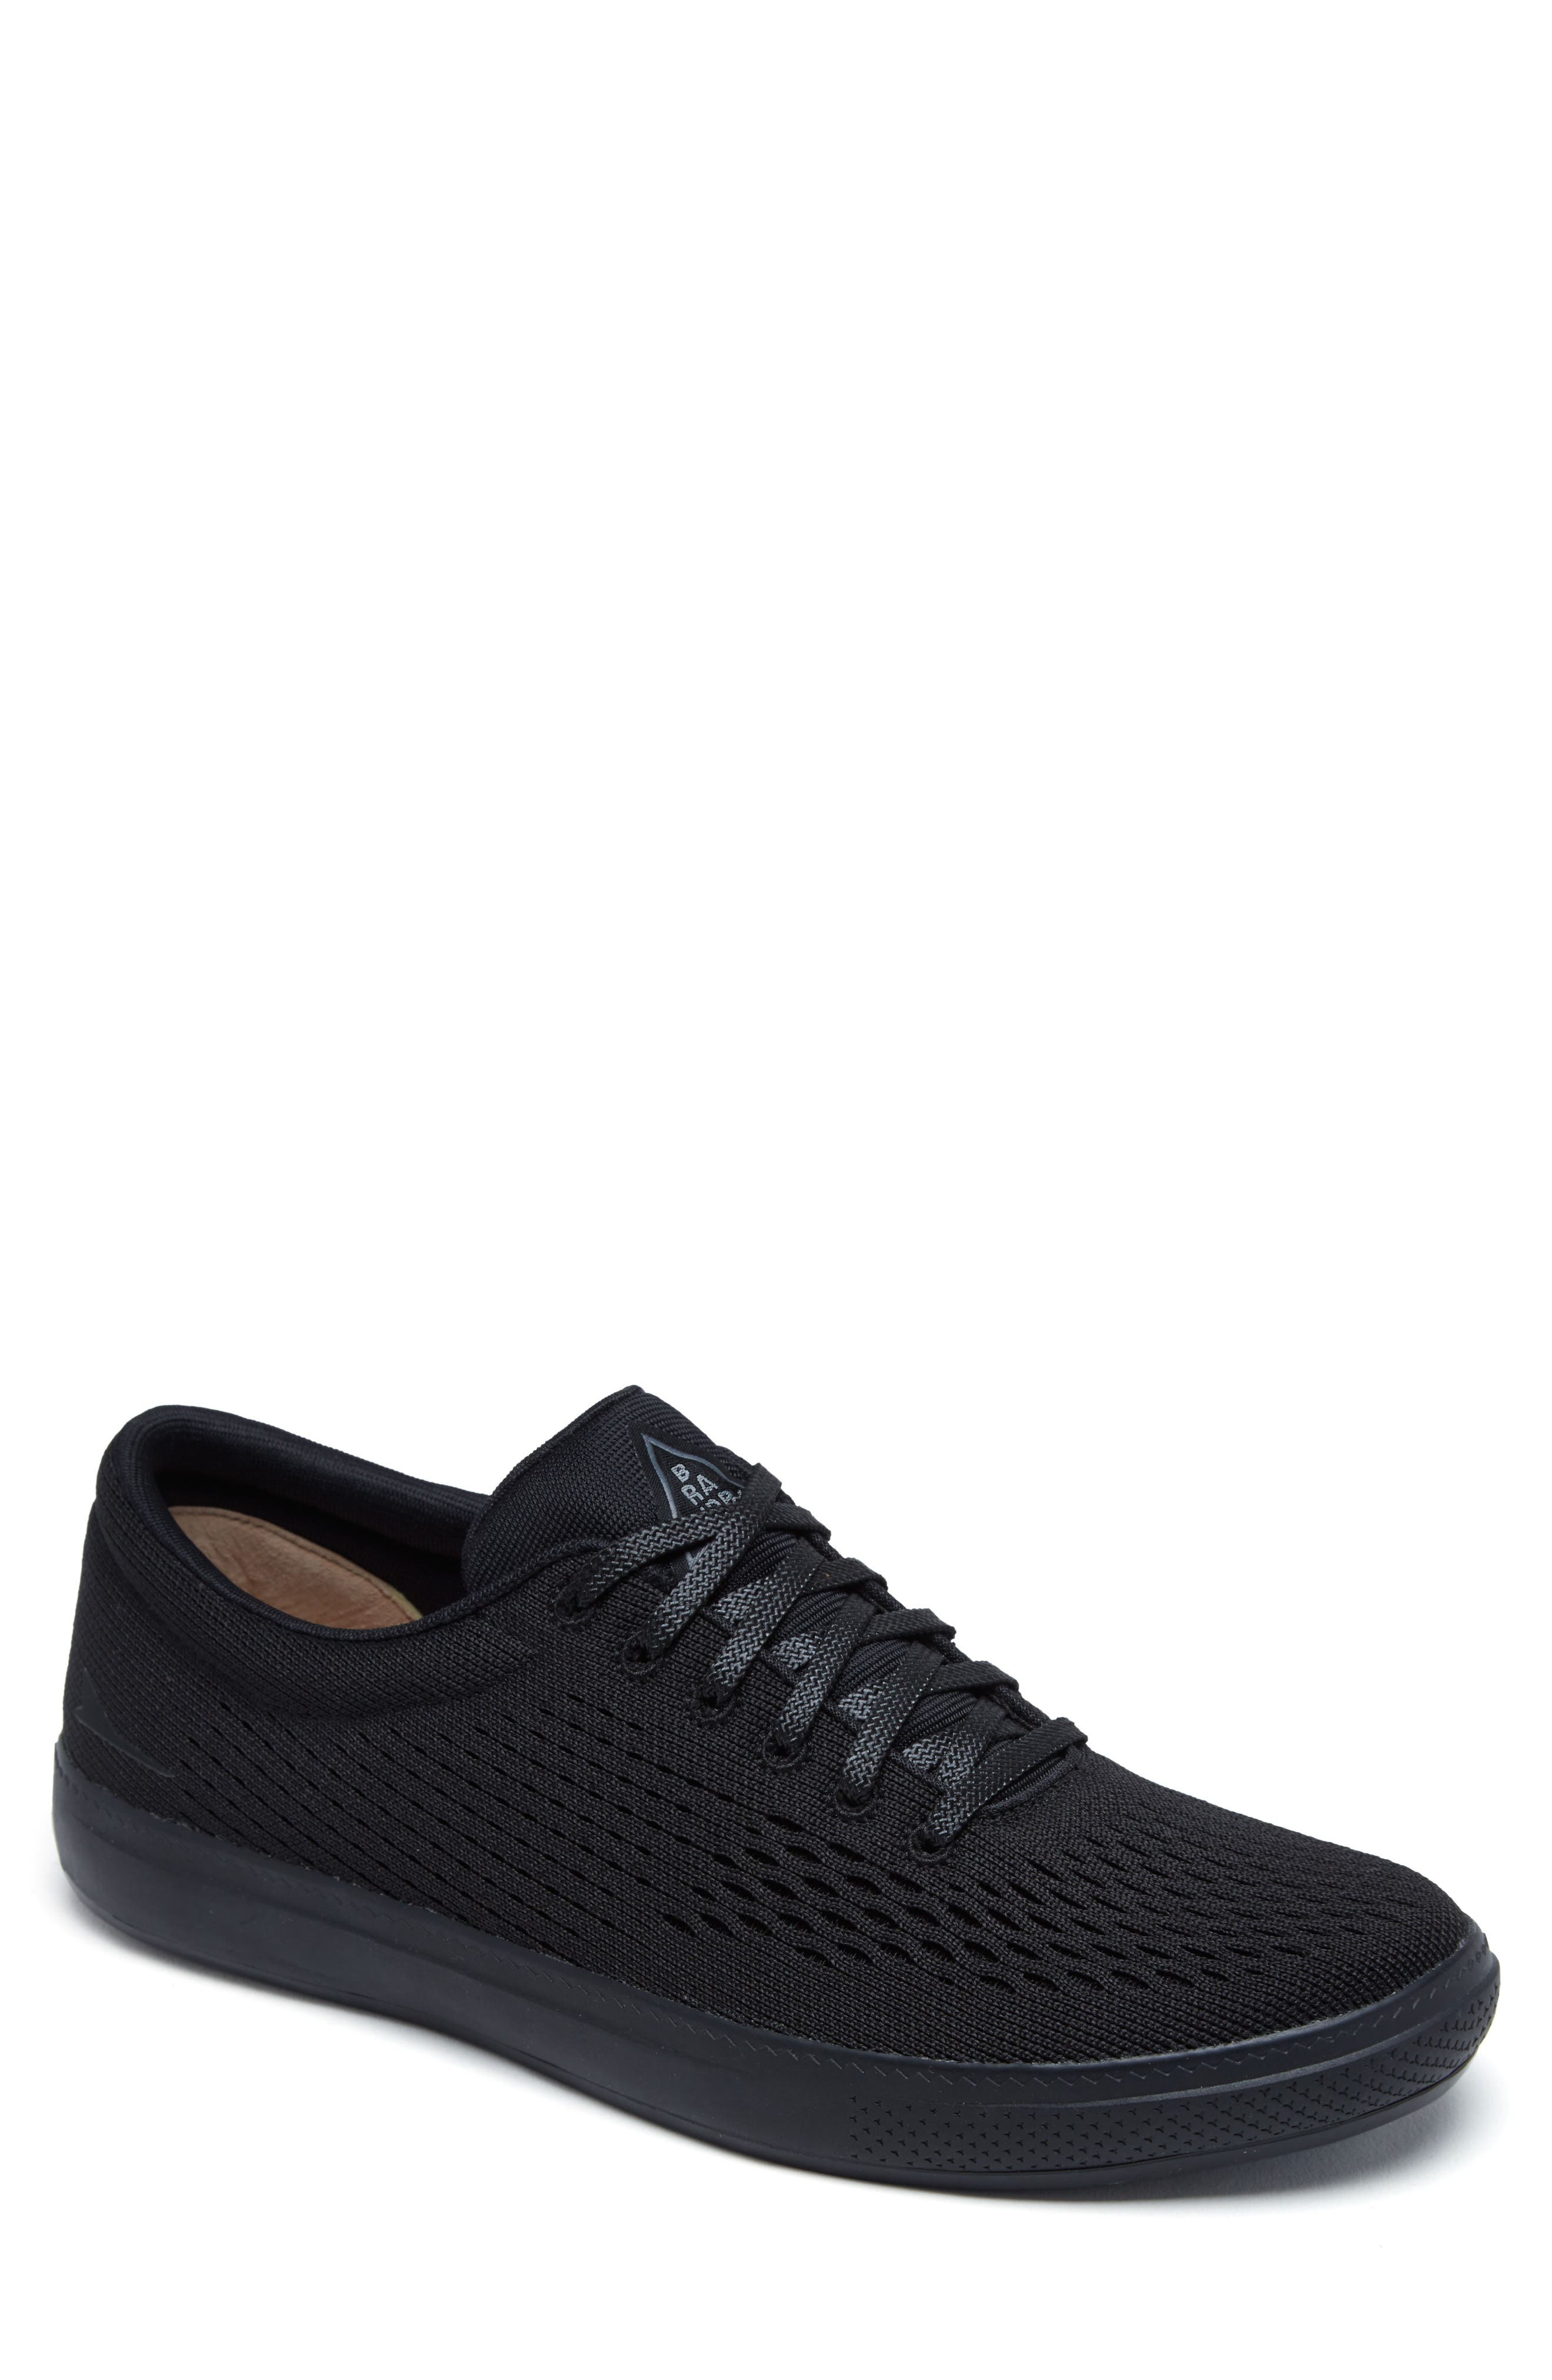 BRANDBLACK August II Sneaker, Main, color, 007